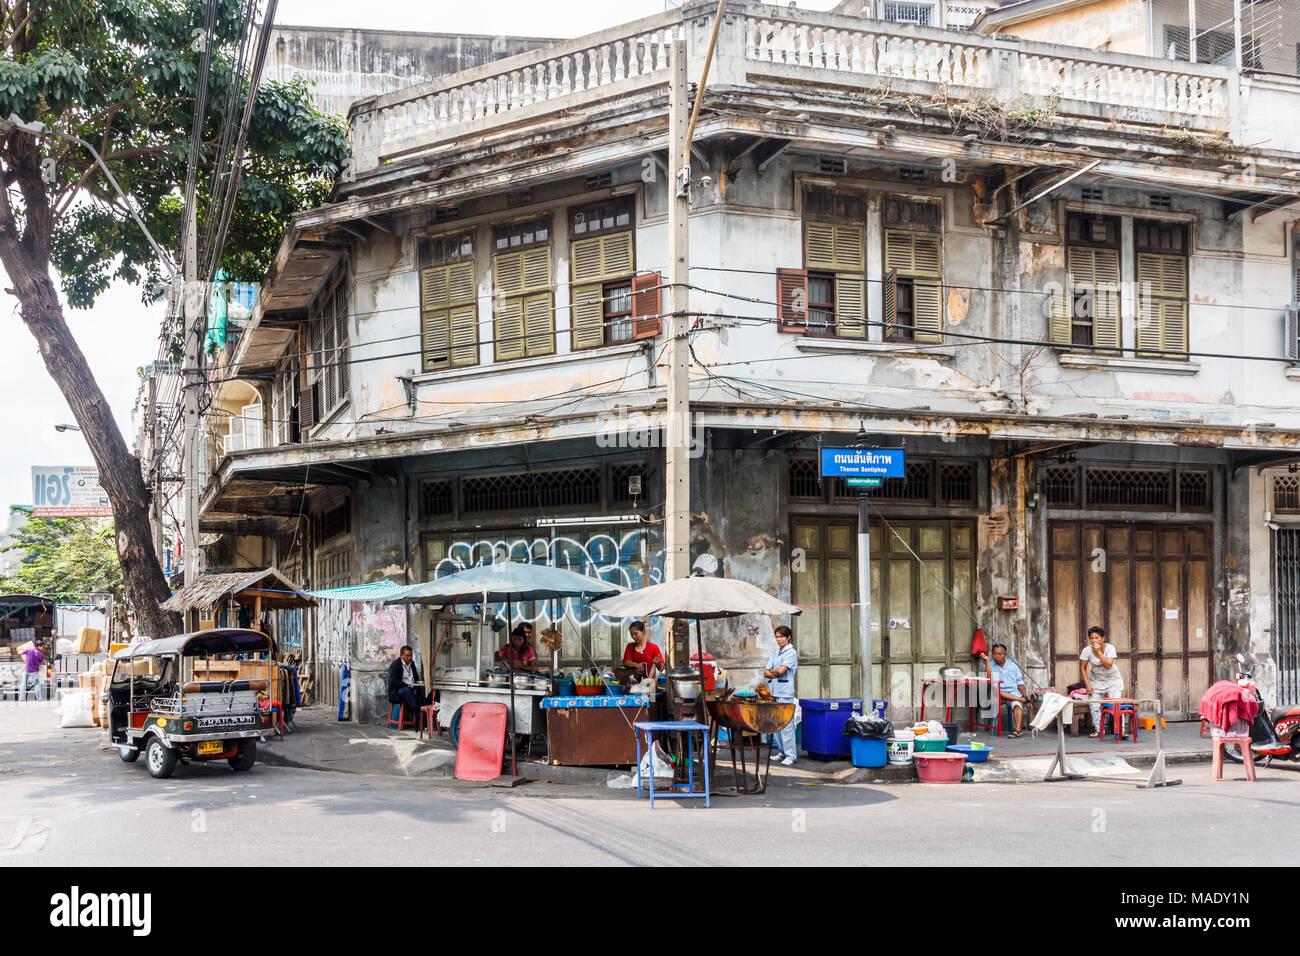 Typical street corner, outdoor cafe, restaurant, Chinatown, Bangkok, Thailand - Stock Image